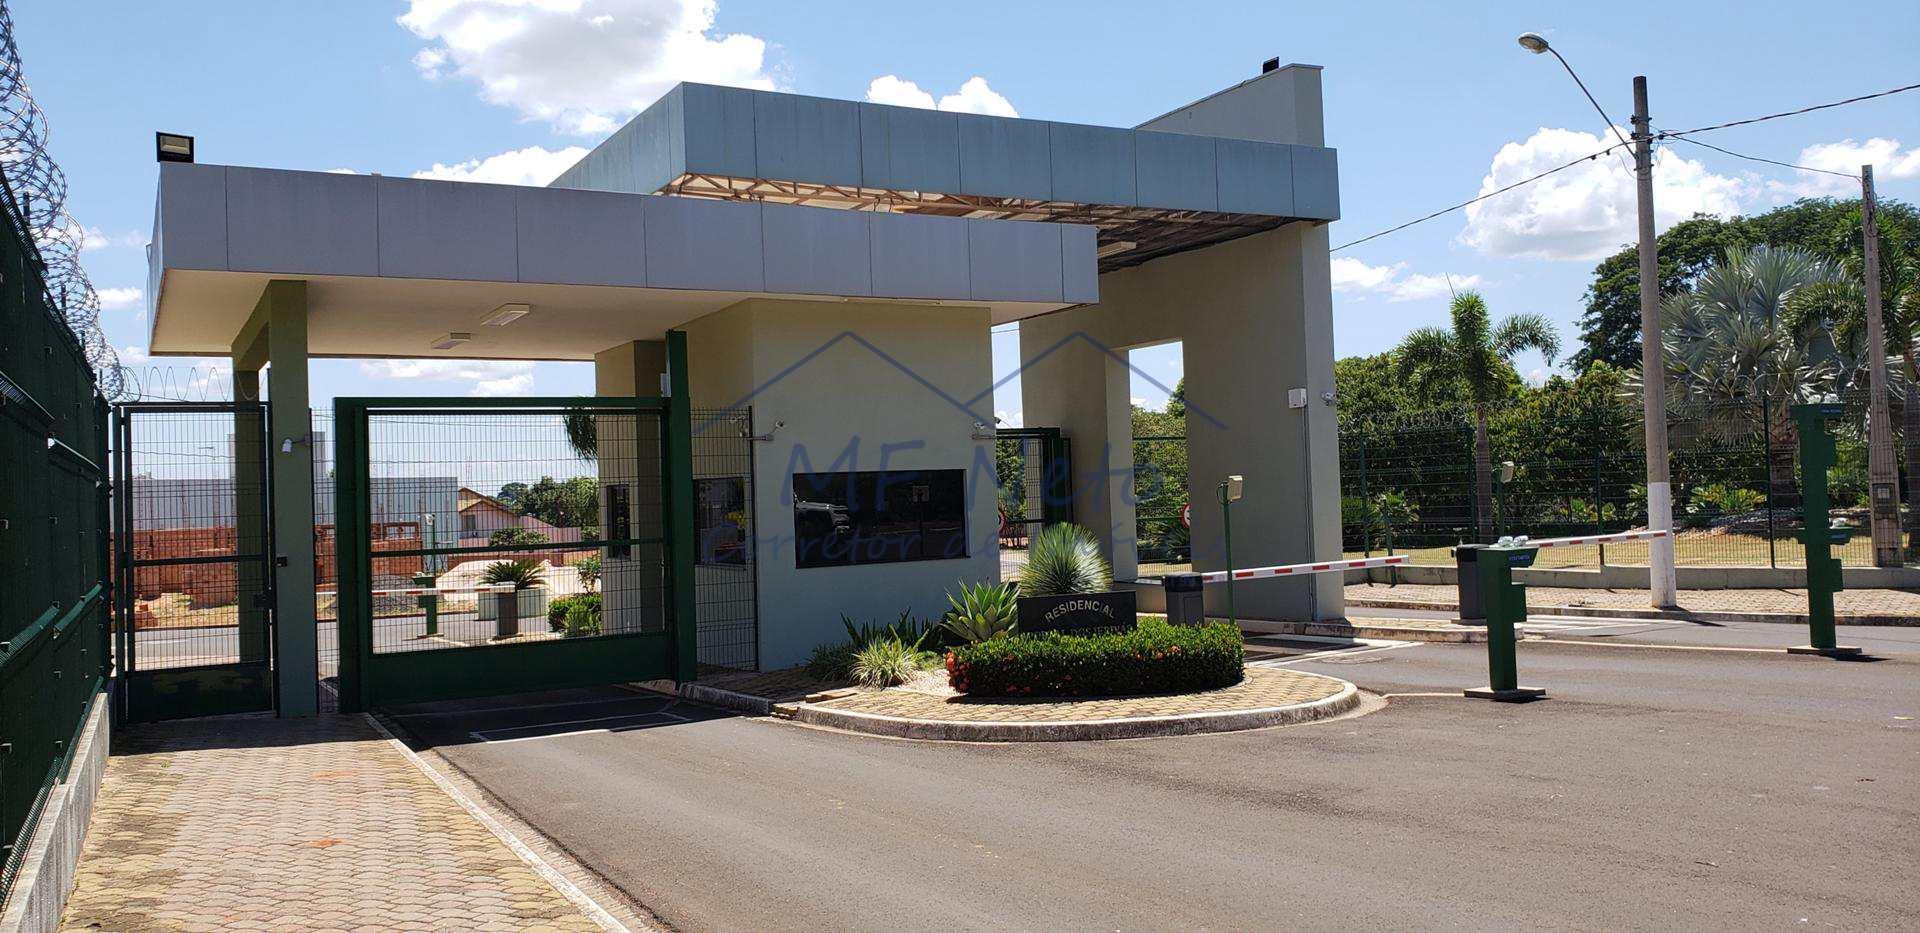 Portal dos Jerivás Pirassununga SP 0107